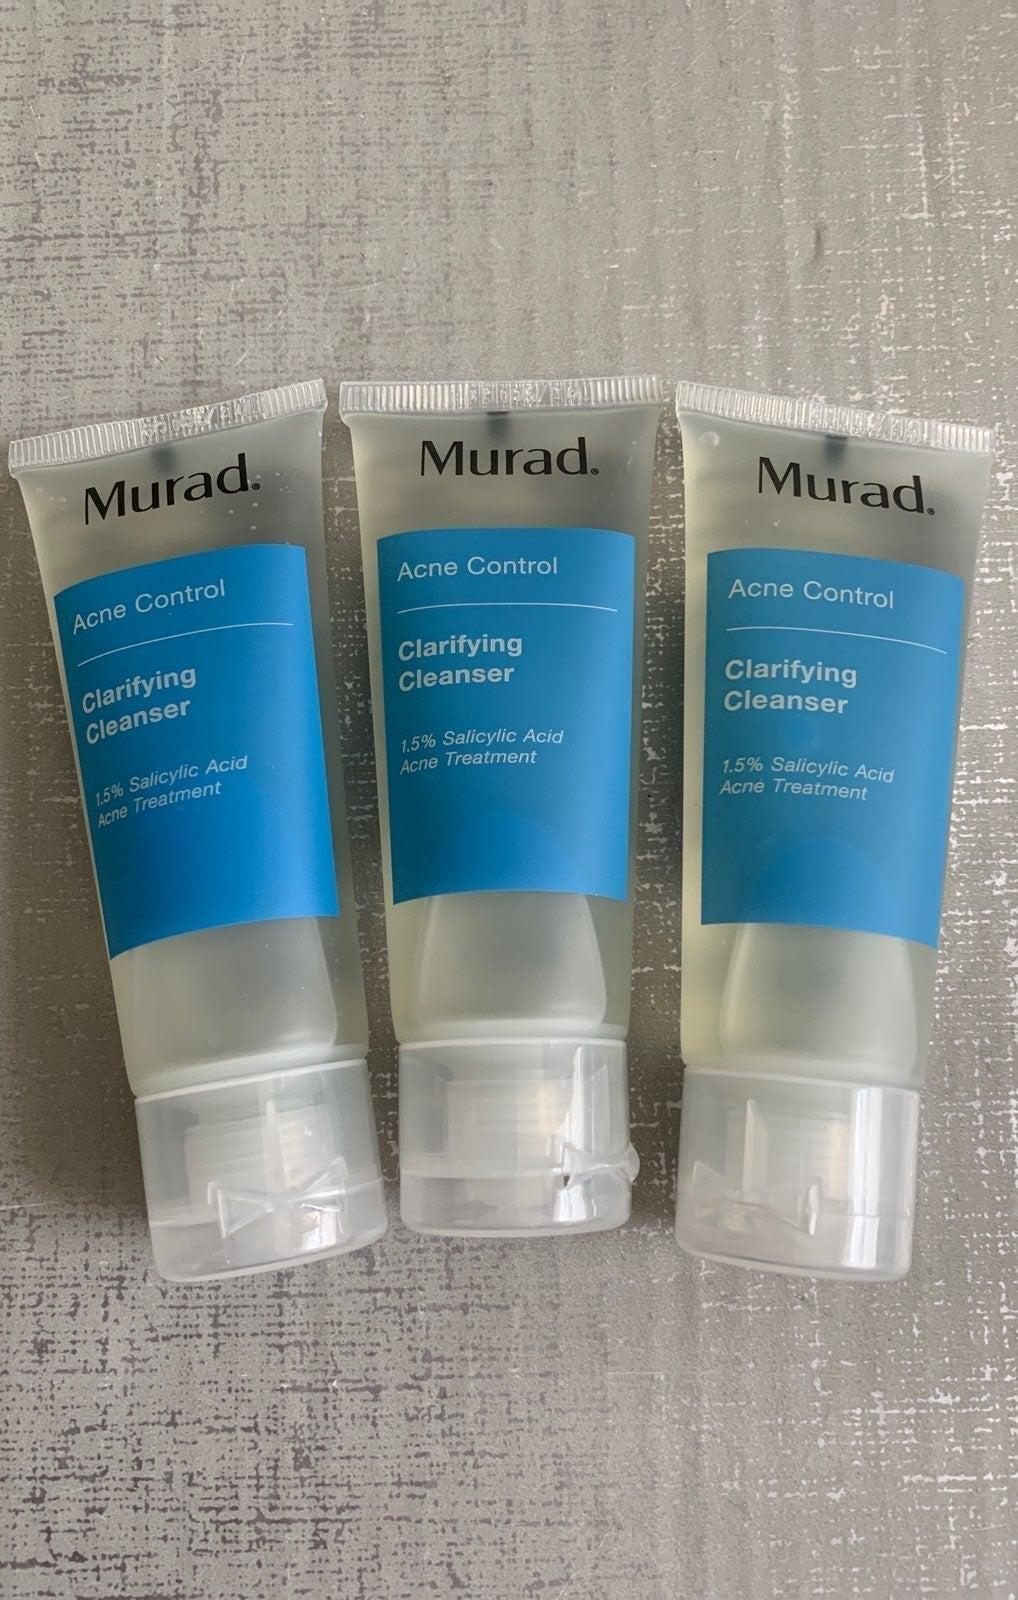 3 Murad Acne Control Clarifying Cleanser